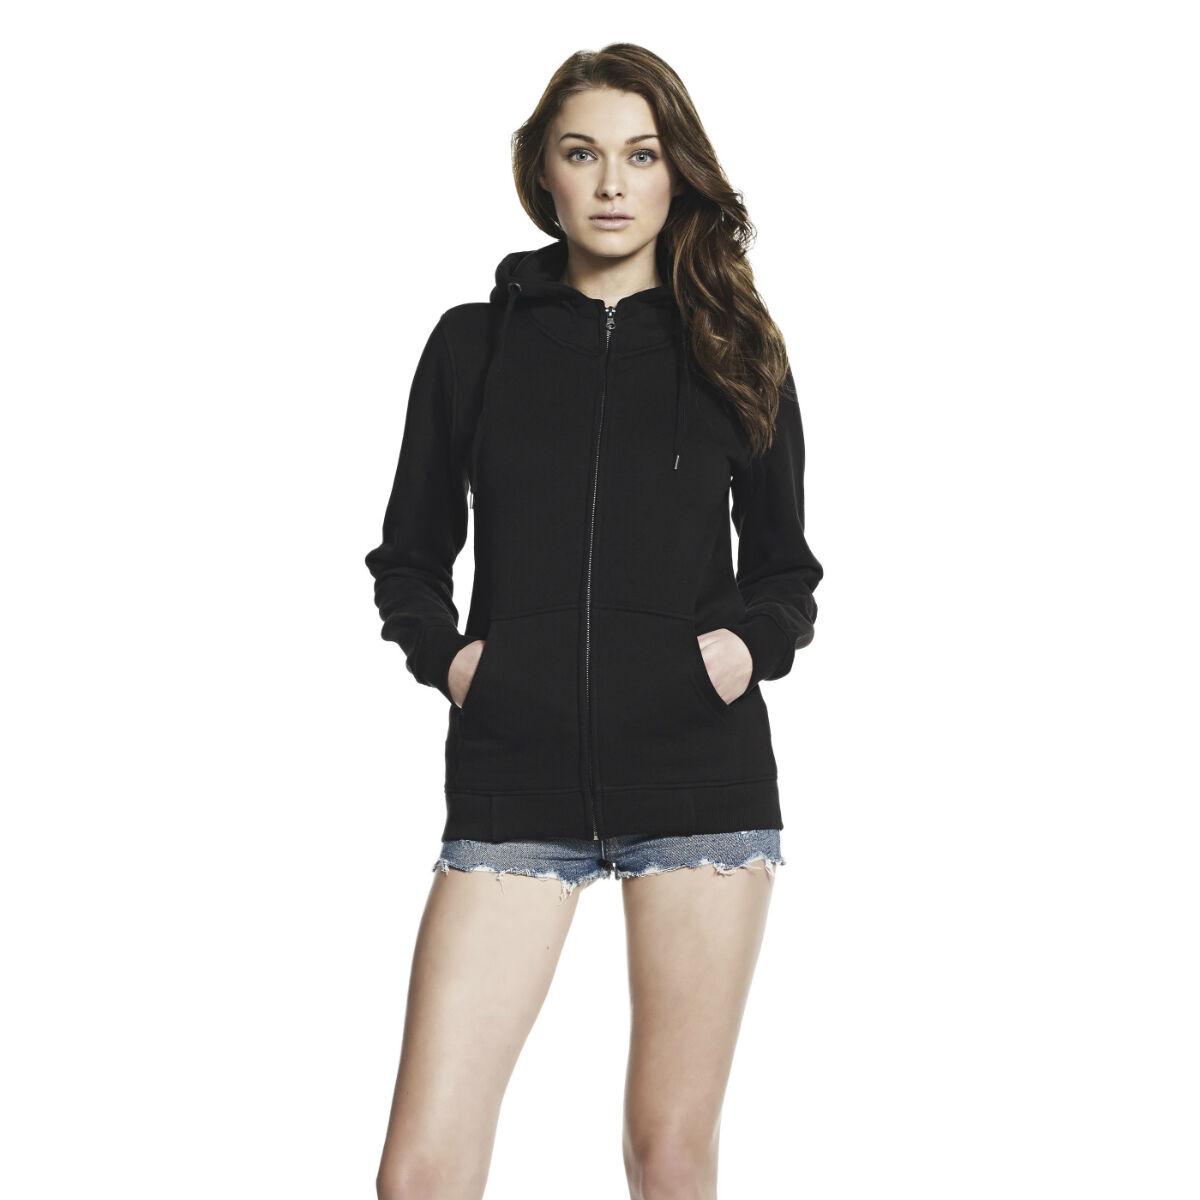 Ladies Continental Embroidered Hooded Sweatshirt